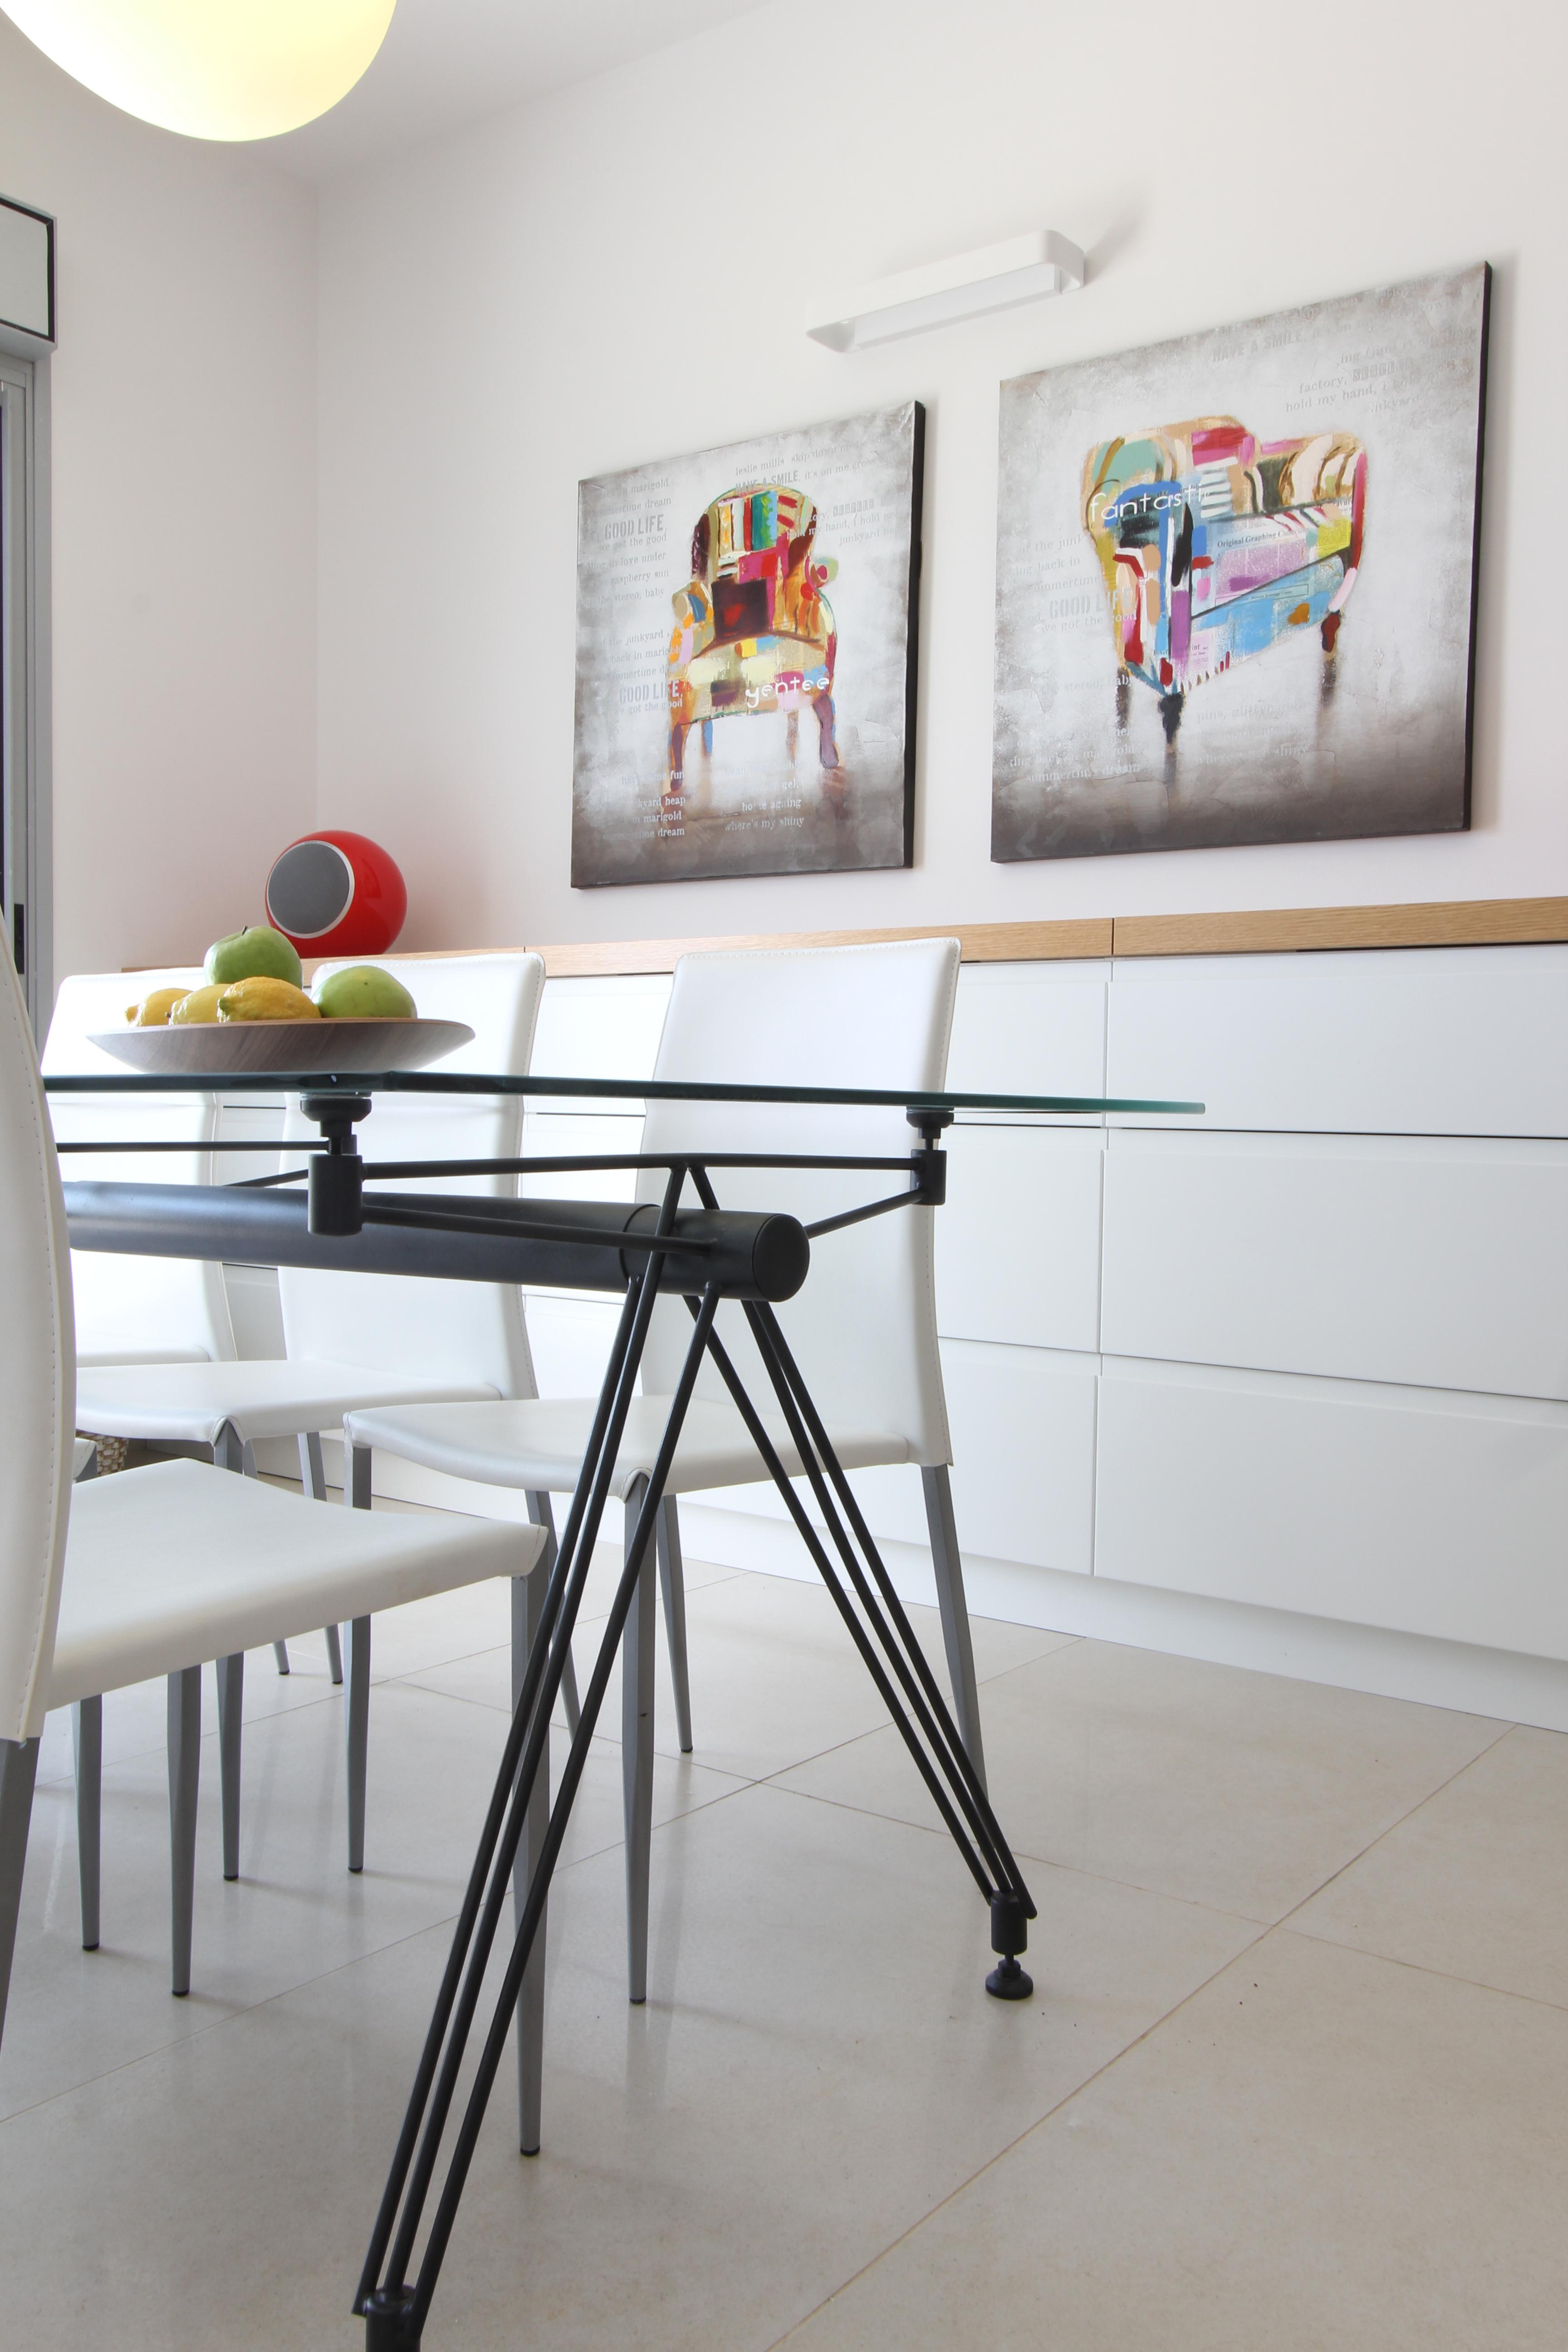 Colors - עיצוב ואדריכלות פנים, פינת אוכל